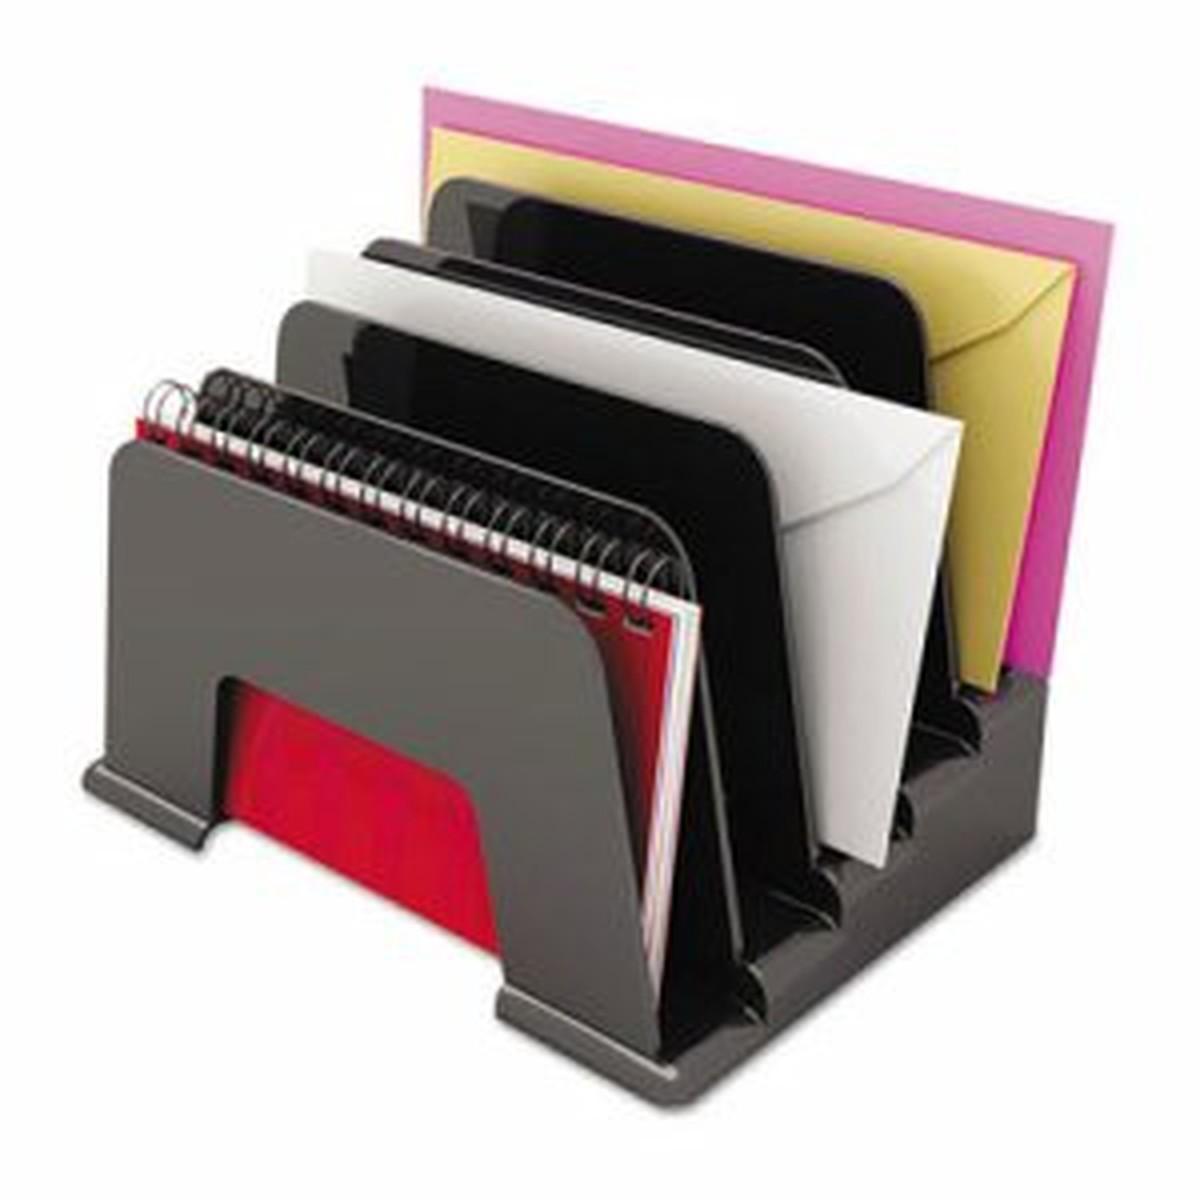 Incline Sorter, Five Sections, Plastic, 8 x 5 1/2 x 6, Black